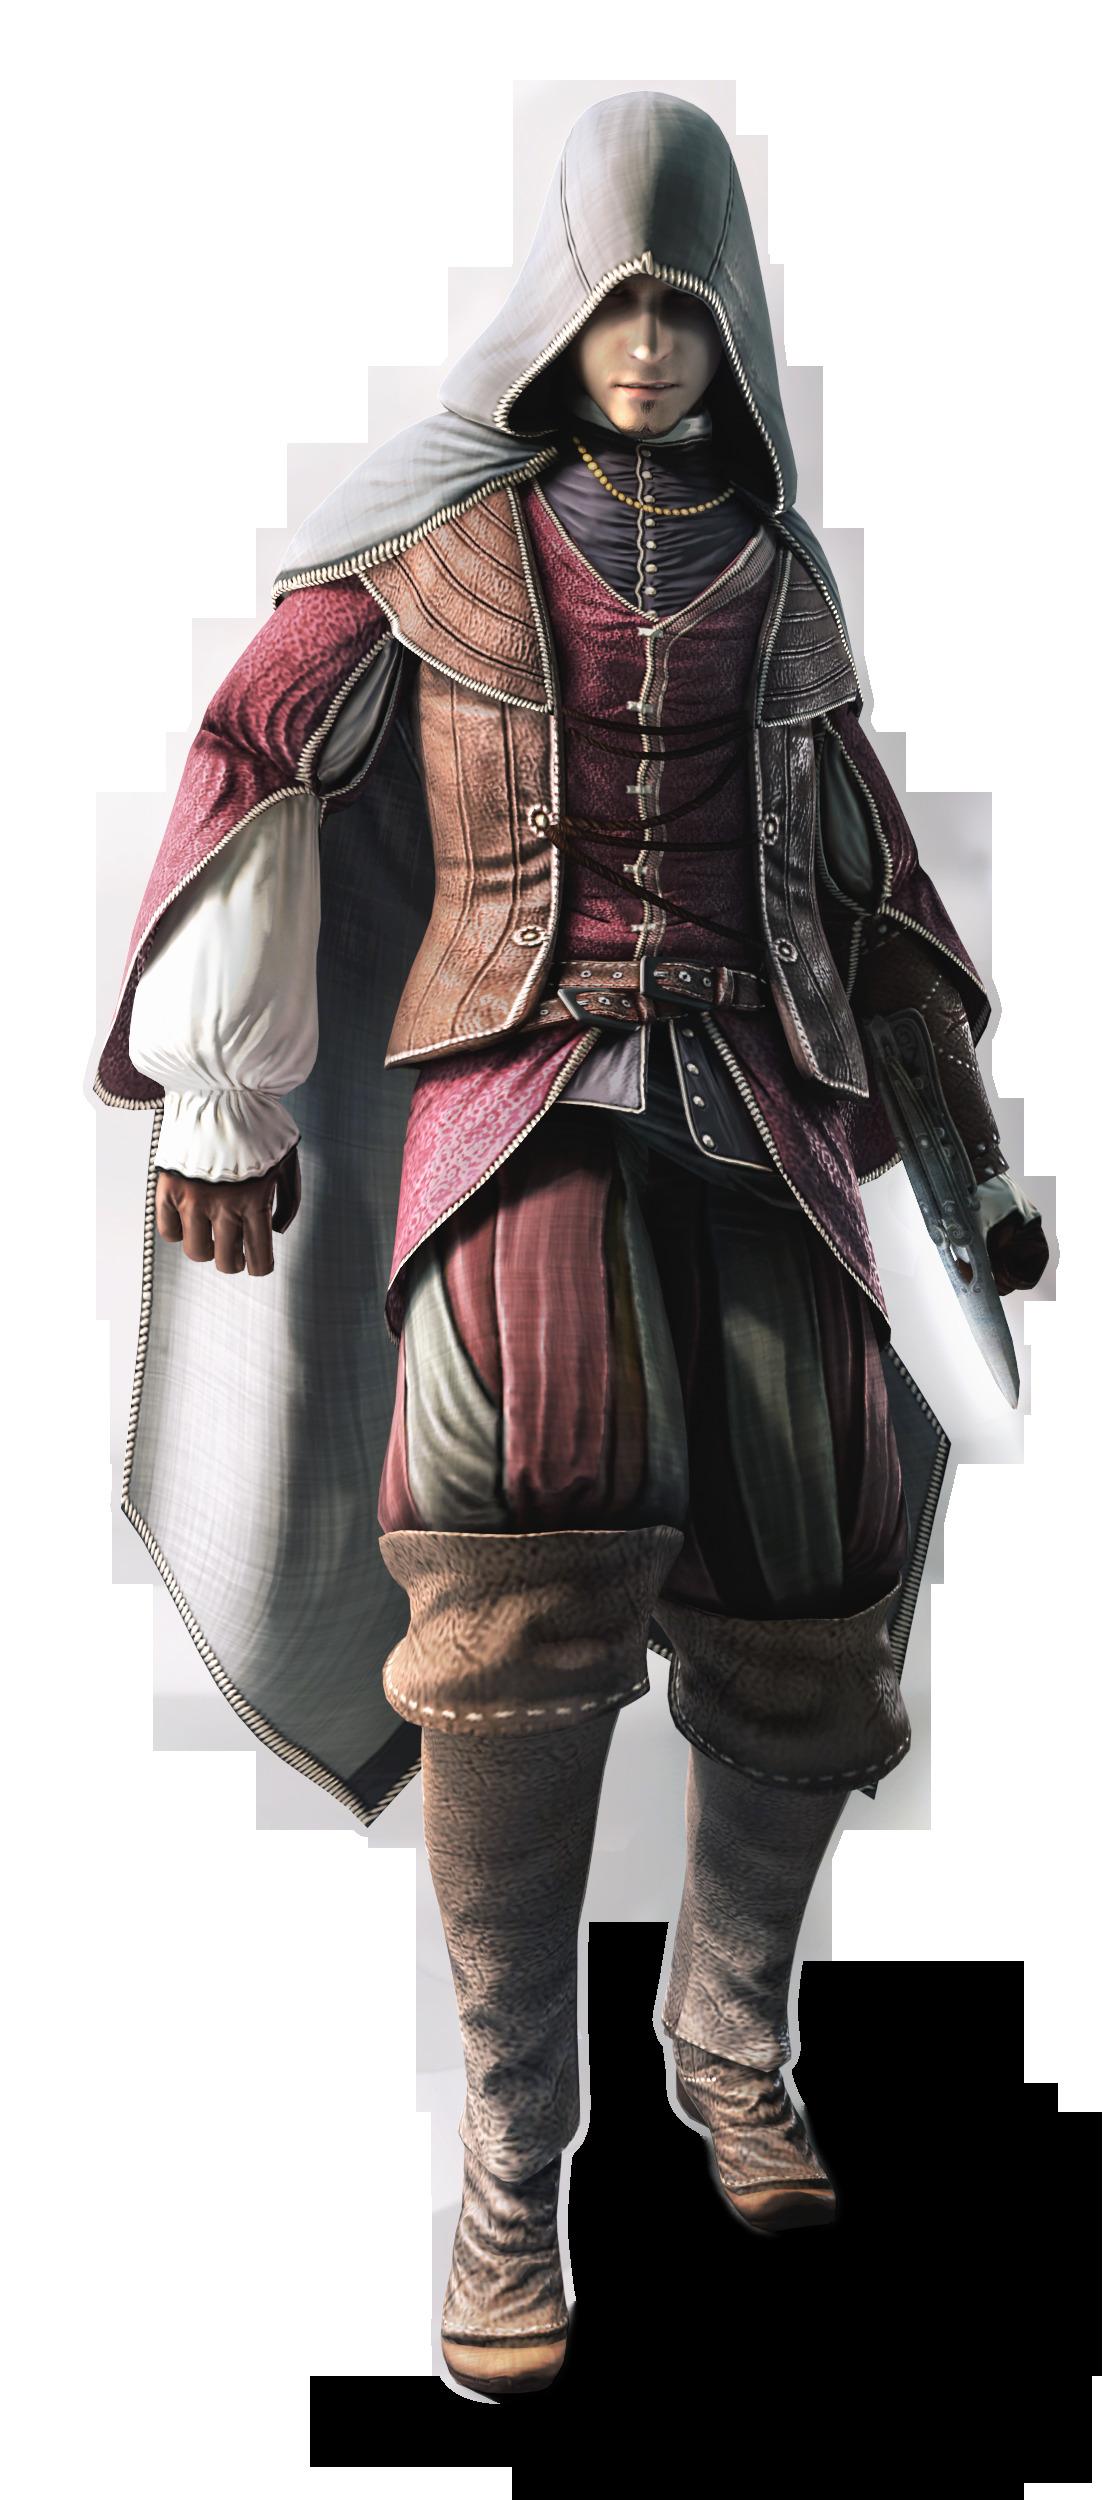 AssassinsCreedBrotherhood Visuel008